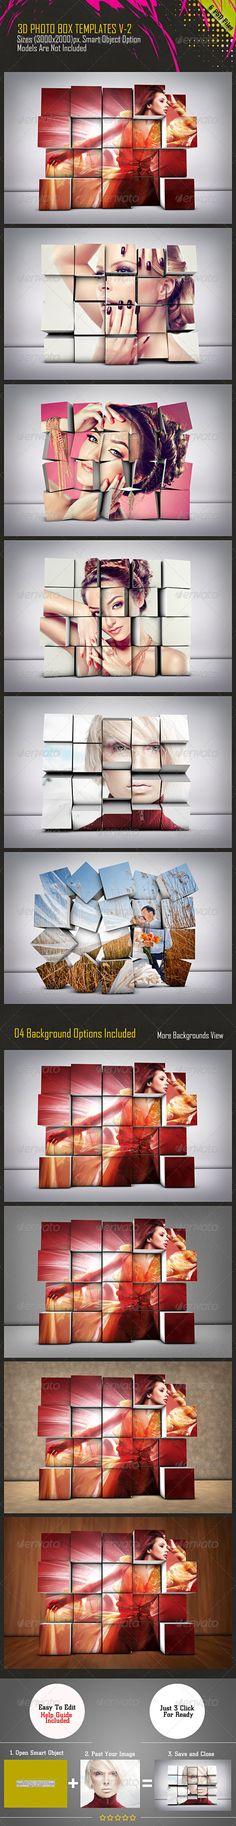 3D Photo Box Template PSD #design Download: http://graphicriver.net/item/3d-photo-box-template-v2/7604279?ref=ksioks